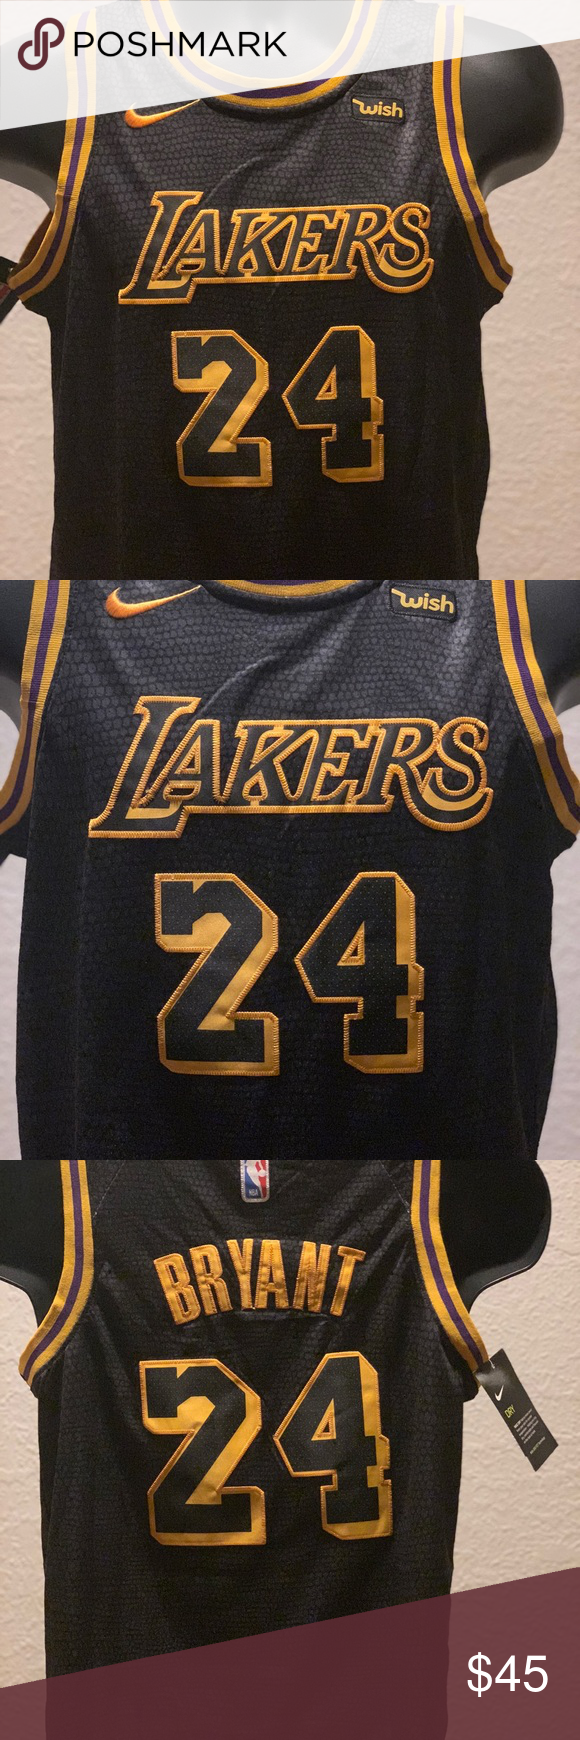 Kobe Bryant Youth Xl City Edition Jersey Nike Los Angeles Lakers 24 Kobe Bryant Black Youth Nba Swingman City Edition Jersey Nik Kobe Bryant Bryant Kobe